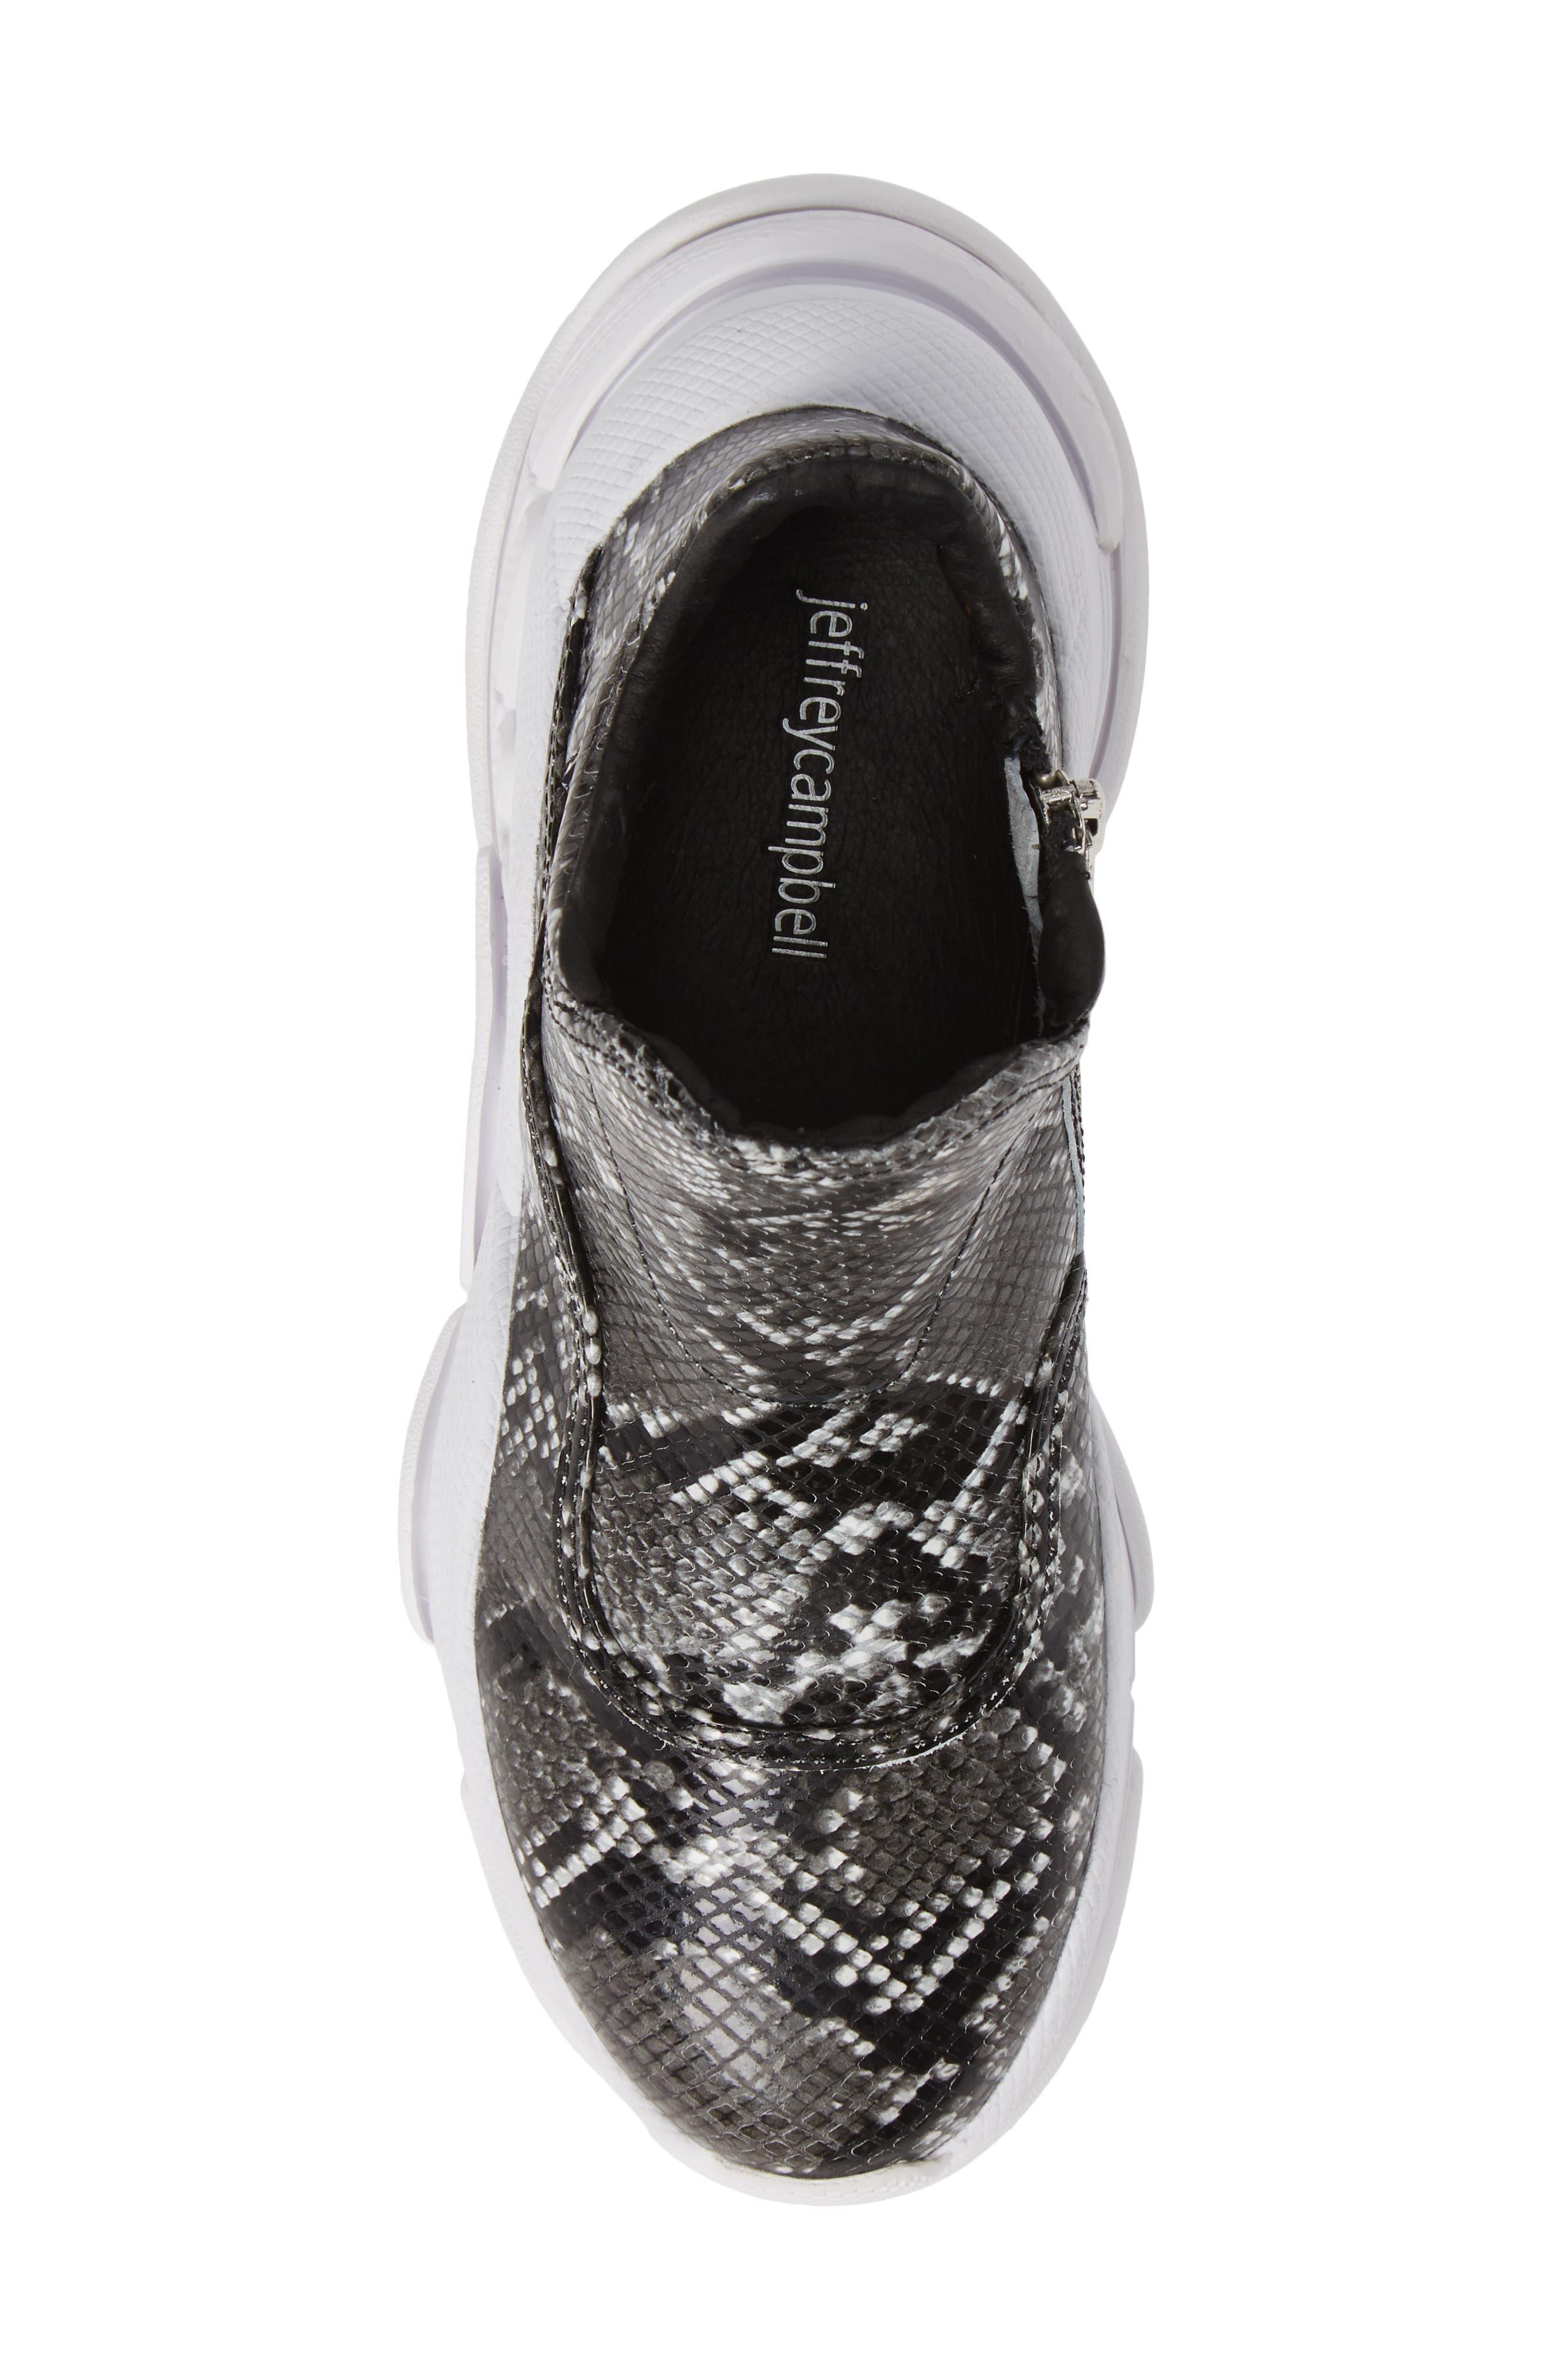 CTRL-DEL Sneaker,                             Alternate thumbnail 5, color,                             GREY BLACK SNAKE